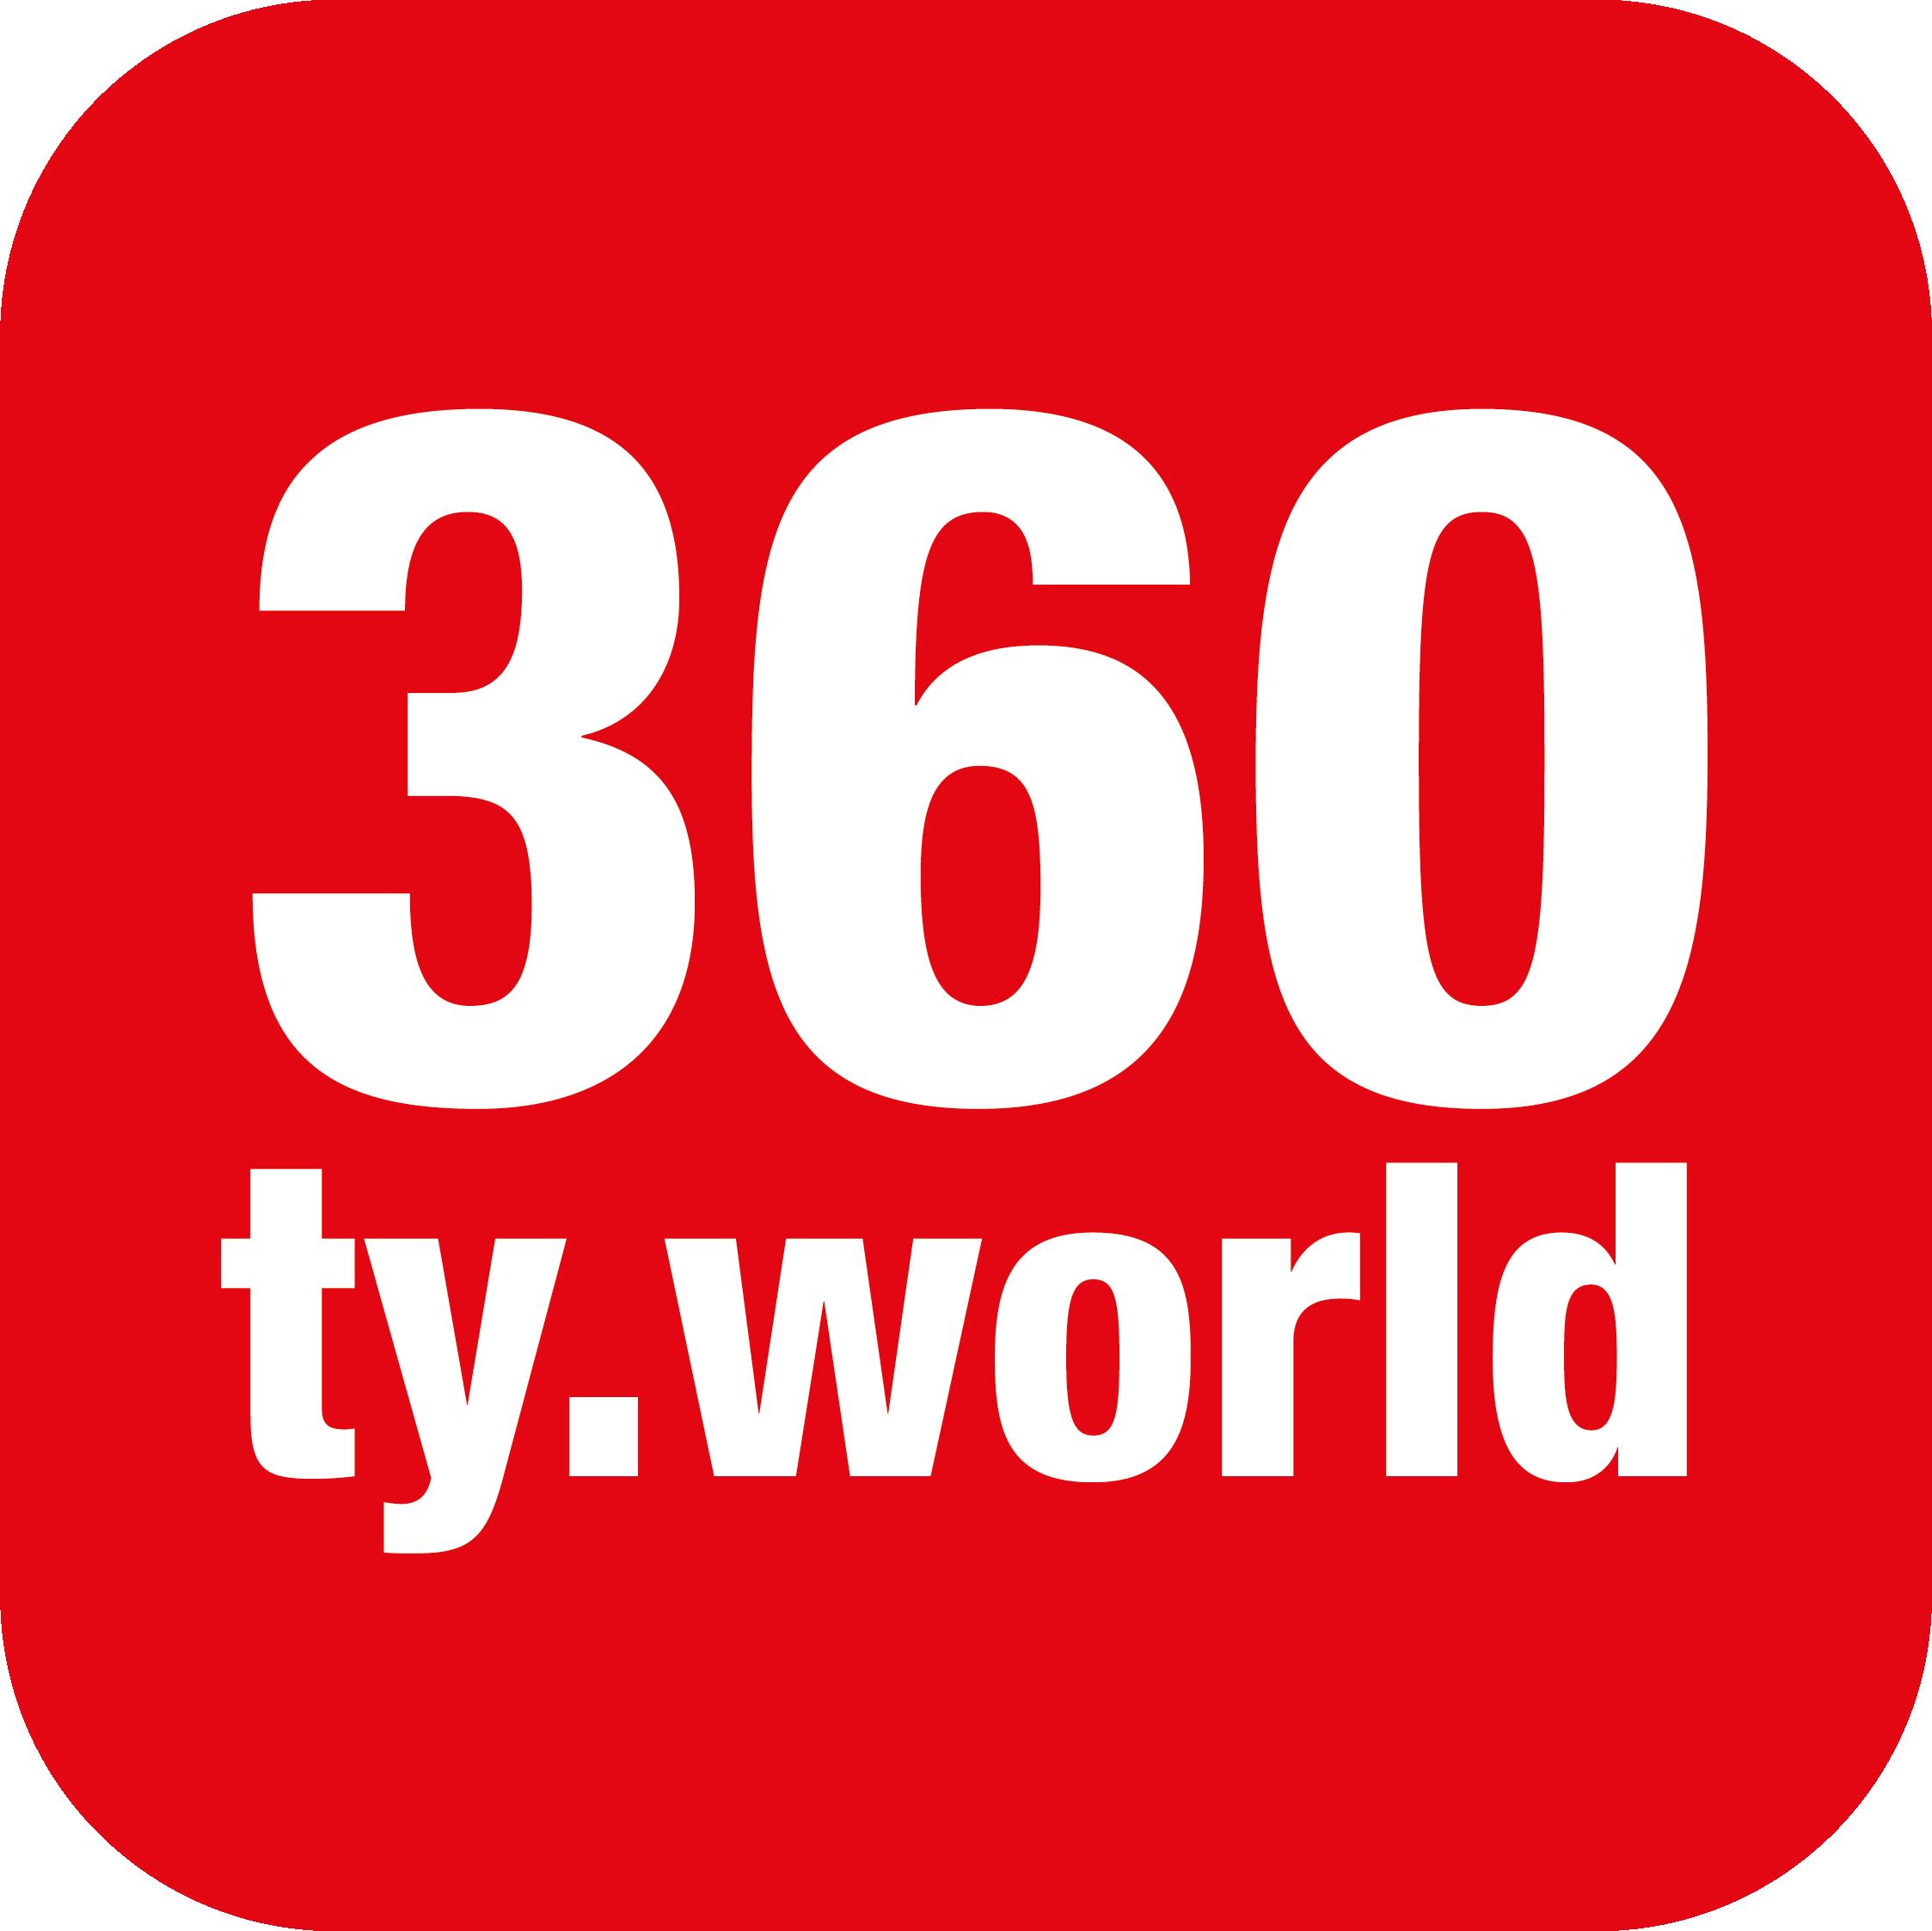 360ty.world